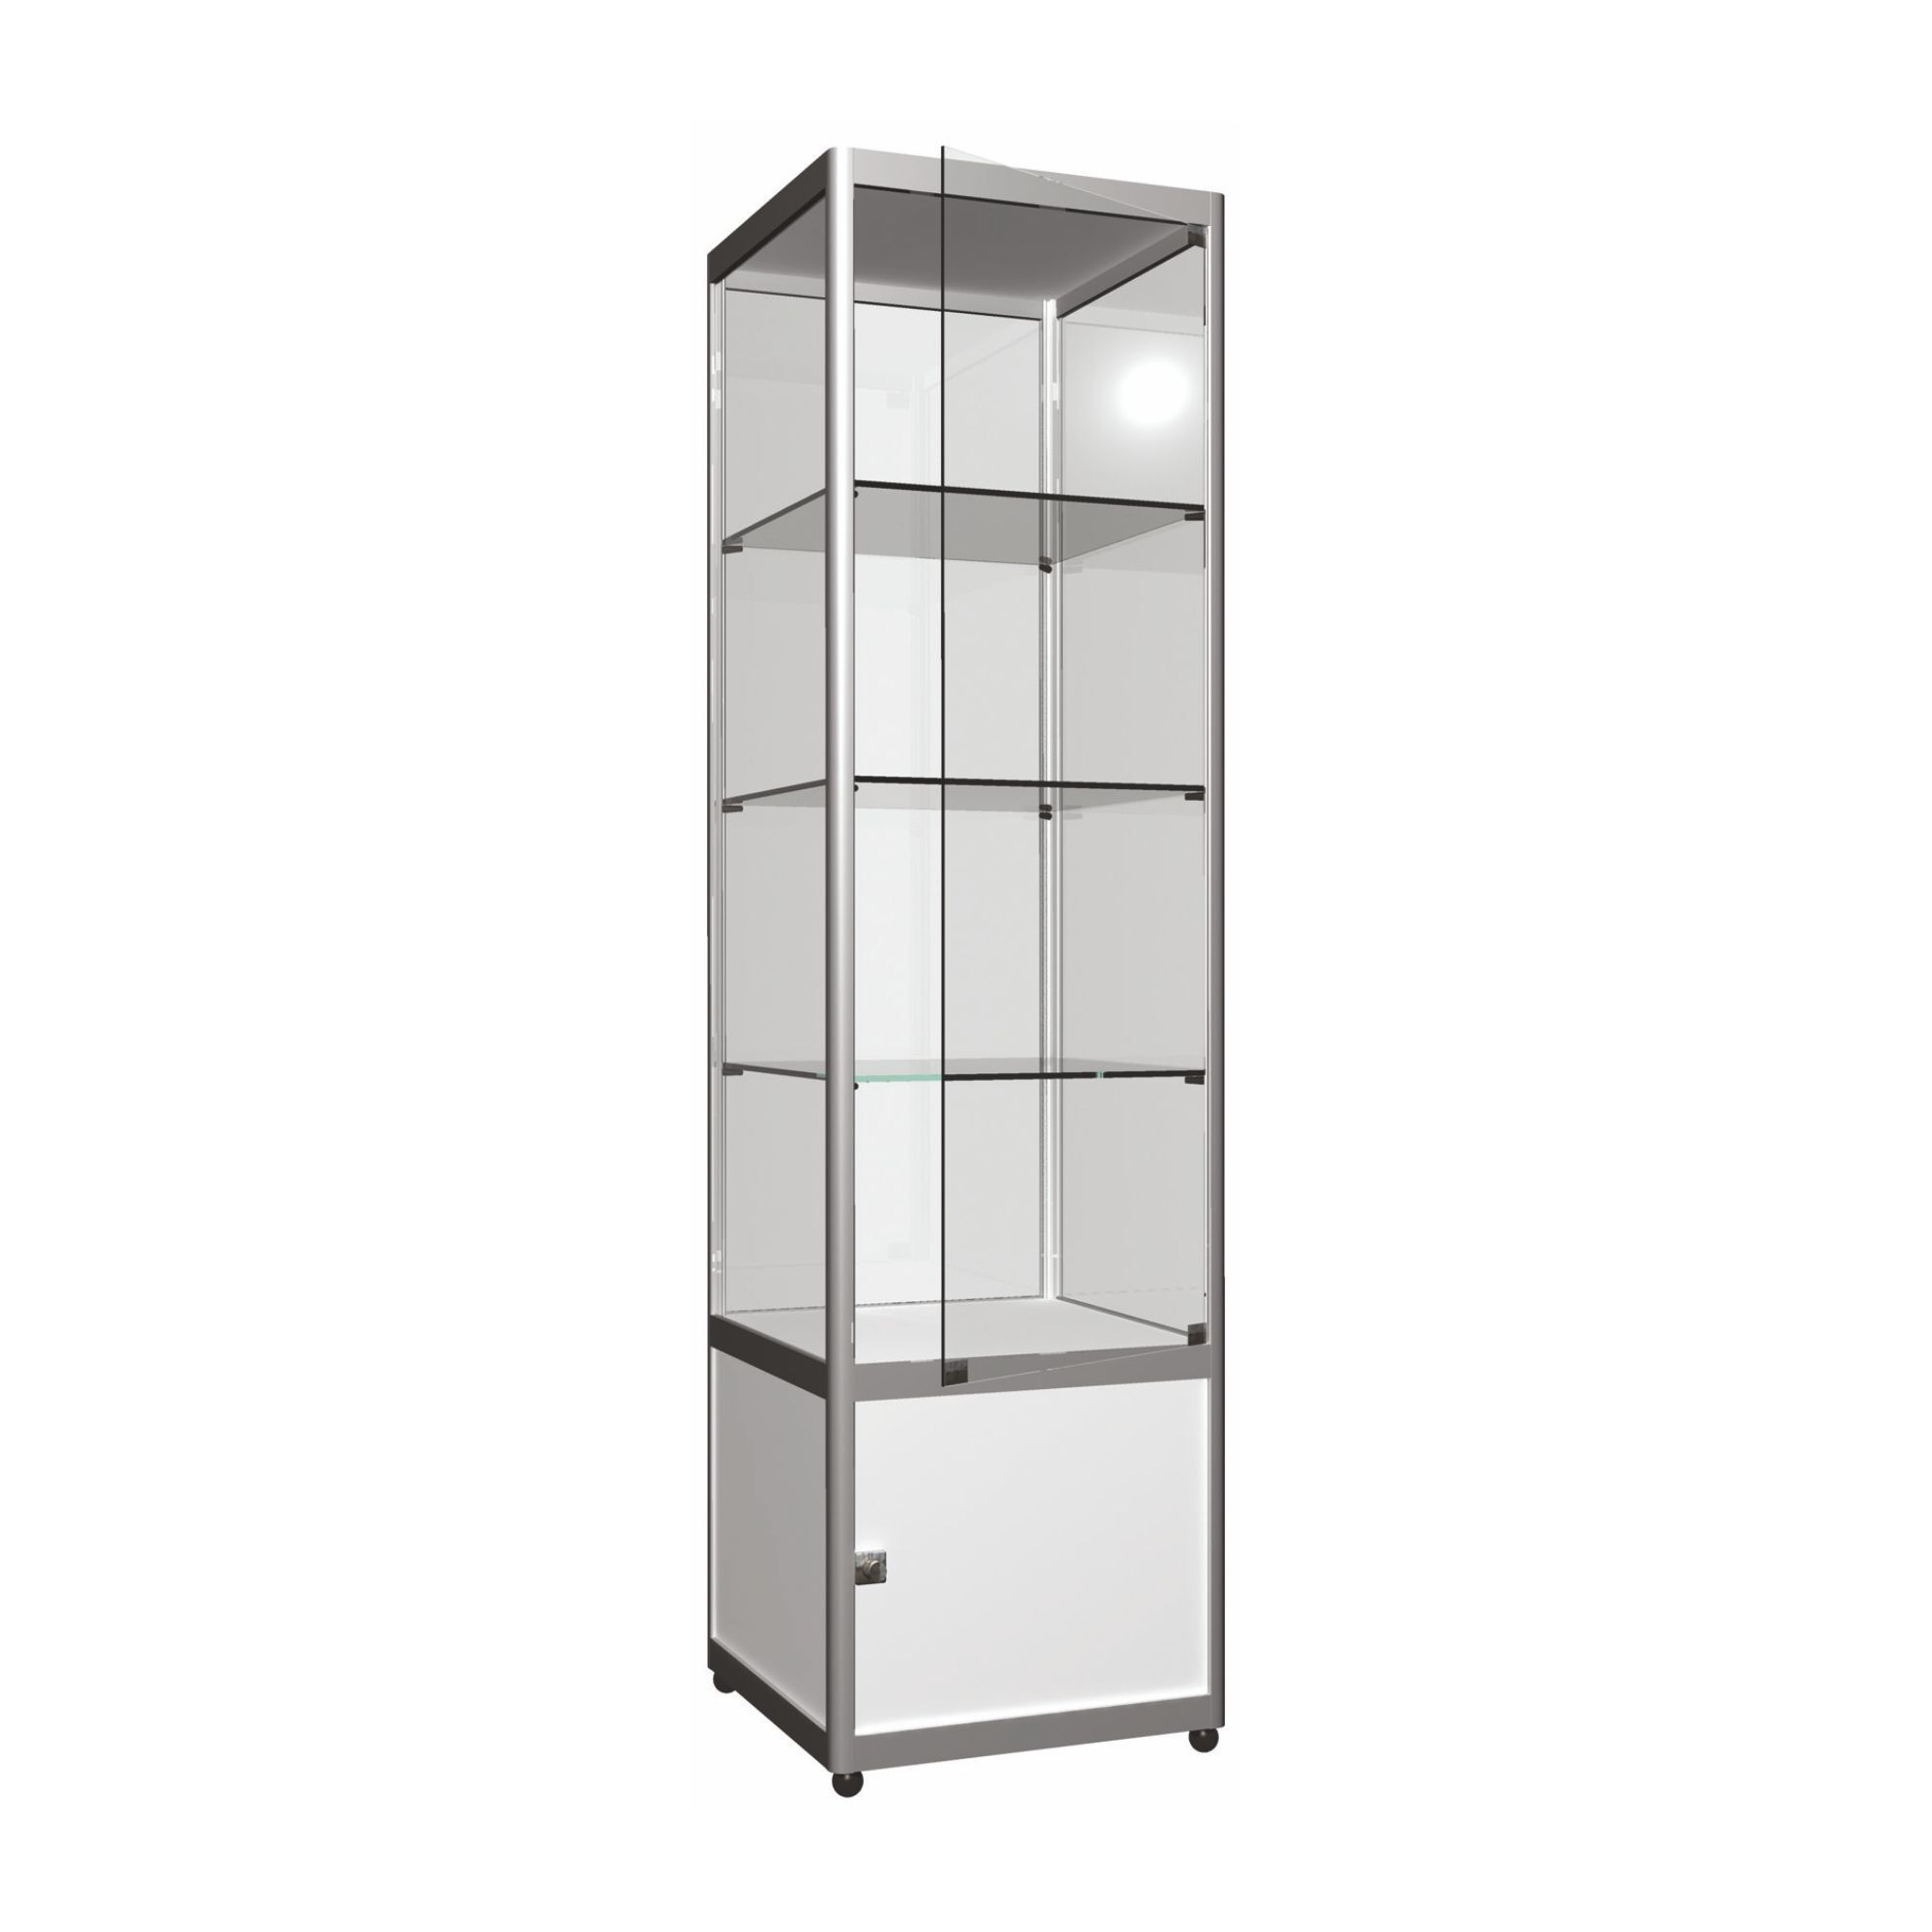 vitrine l50 x h200 x p50 cm en colonne avec stockage